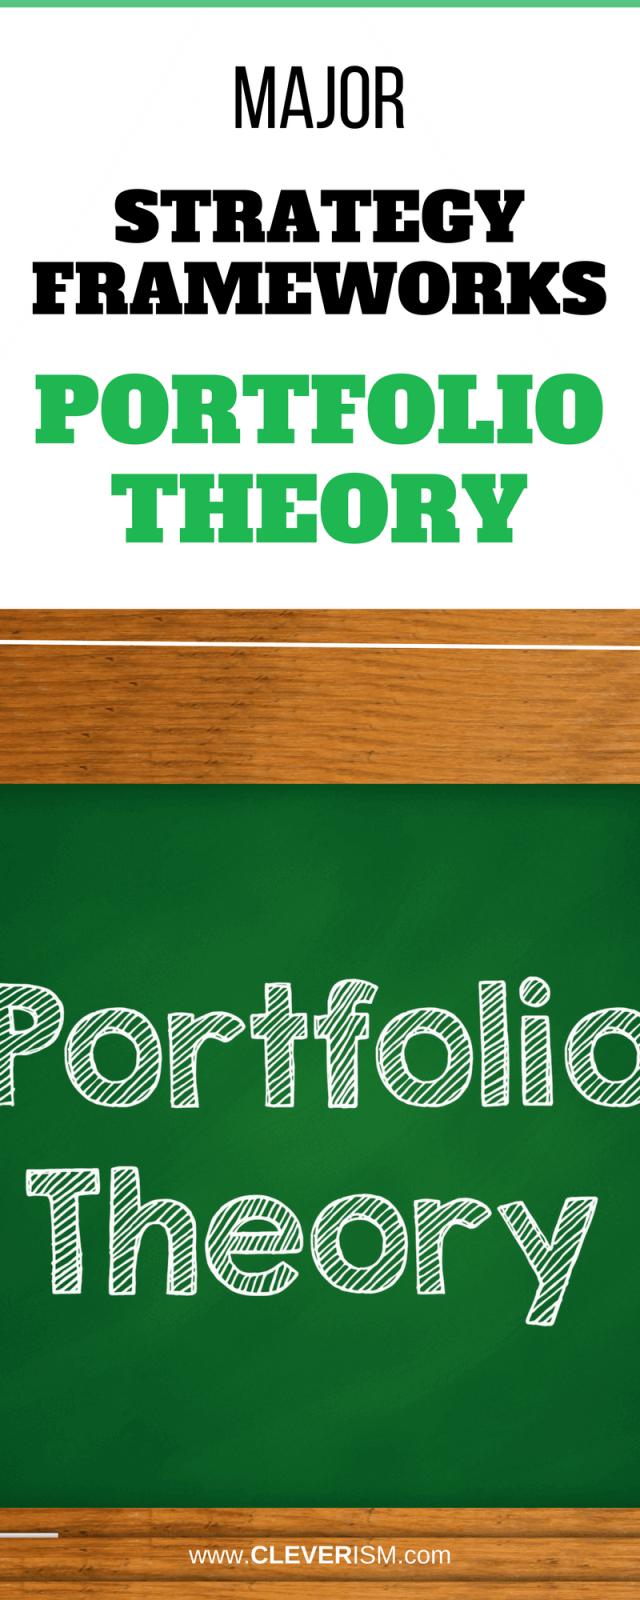 Major Strategy Frameworks Portfolio Theory Modern Portfolio Theory Investment Portfolio Business Strategy Management